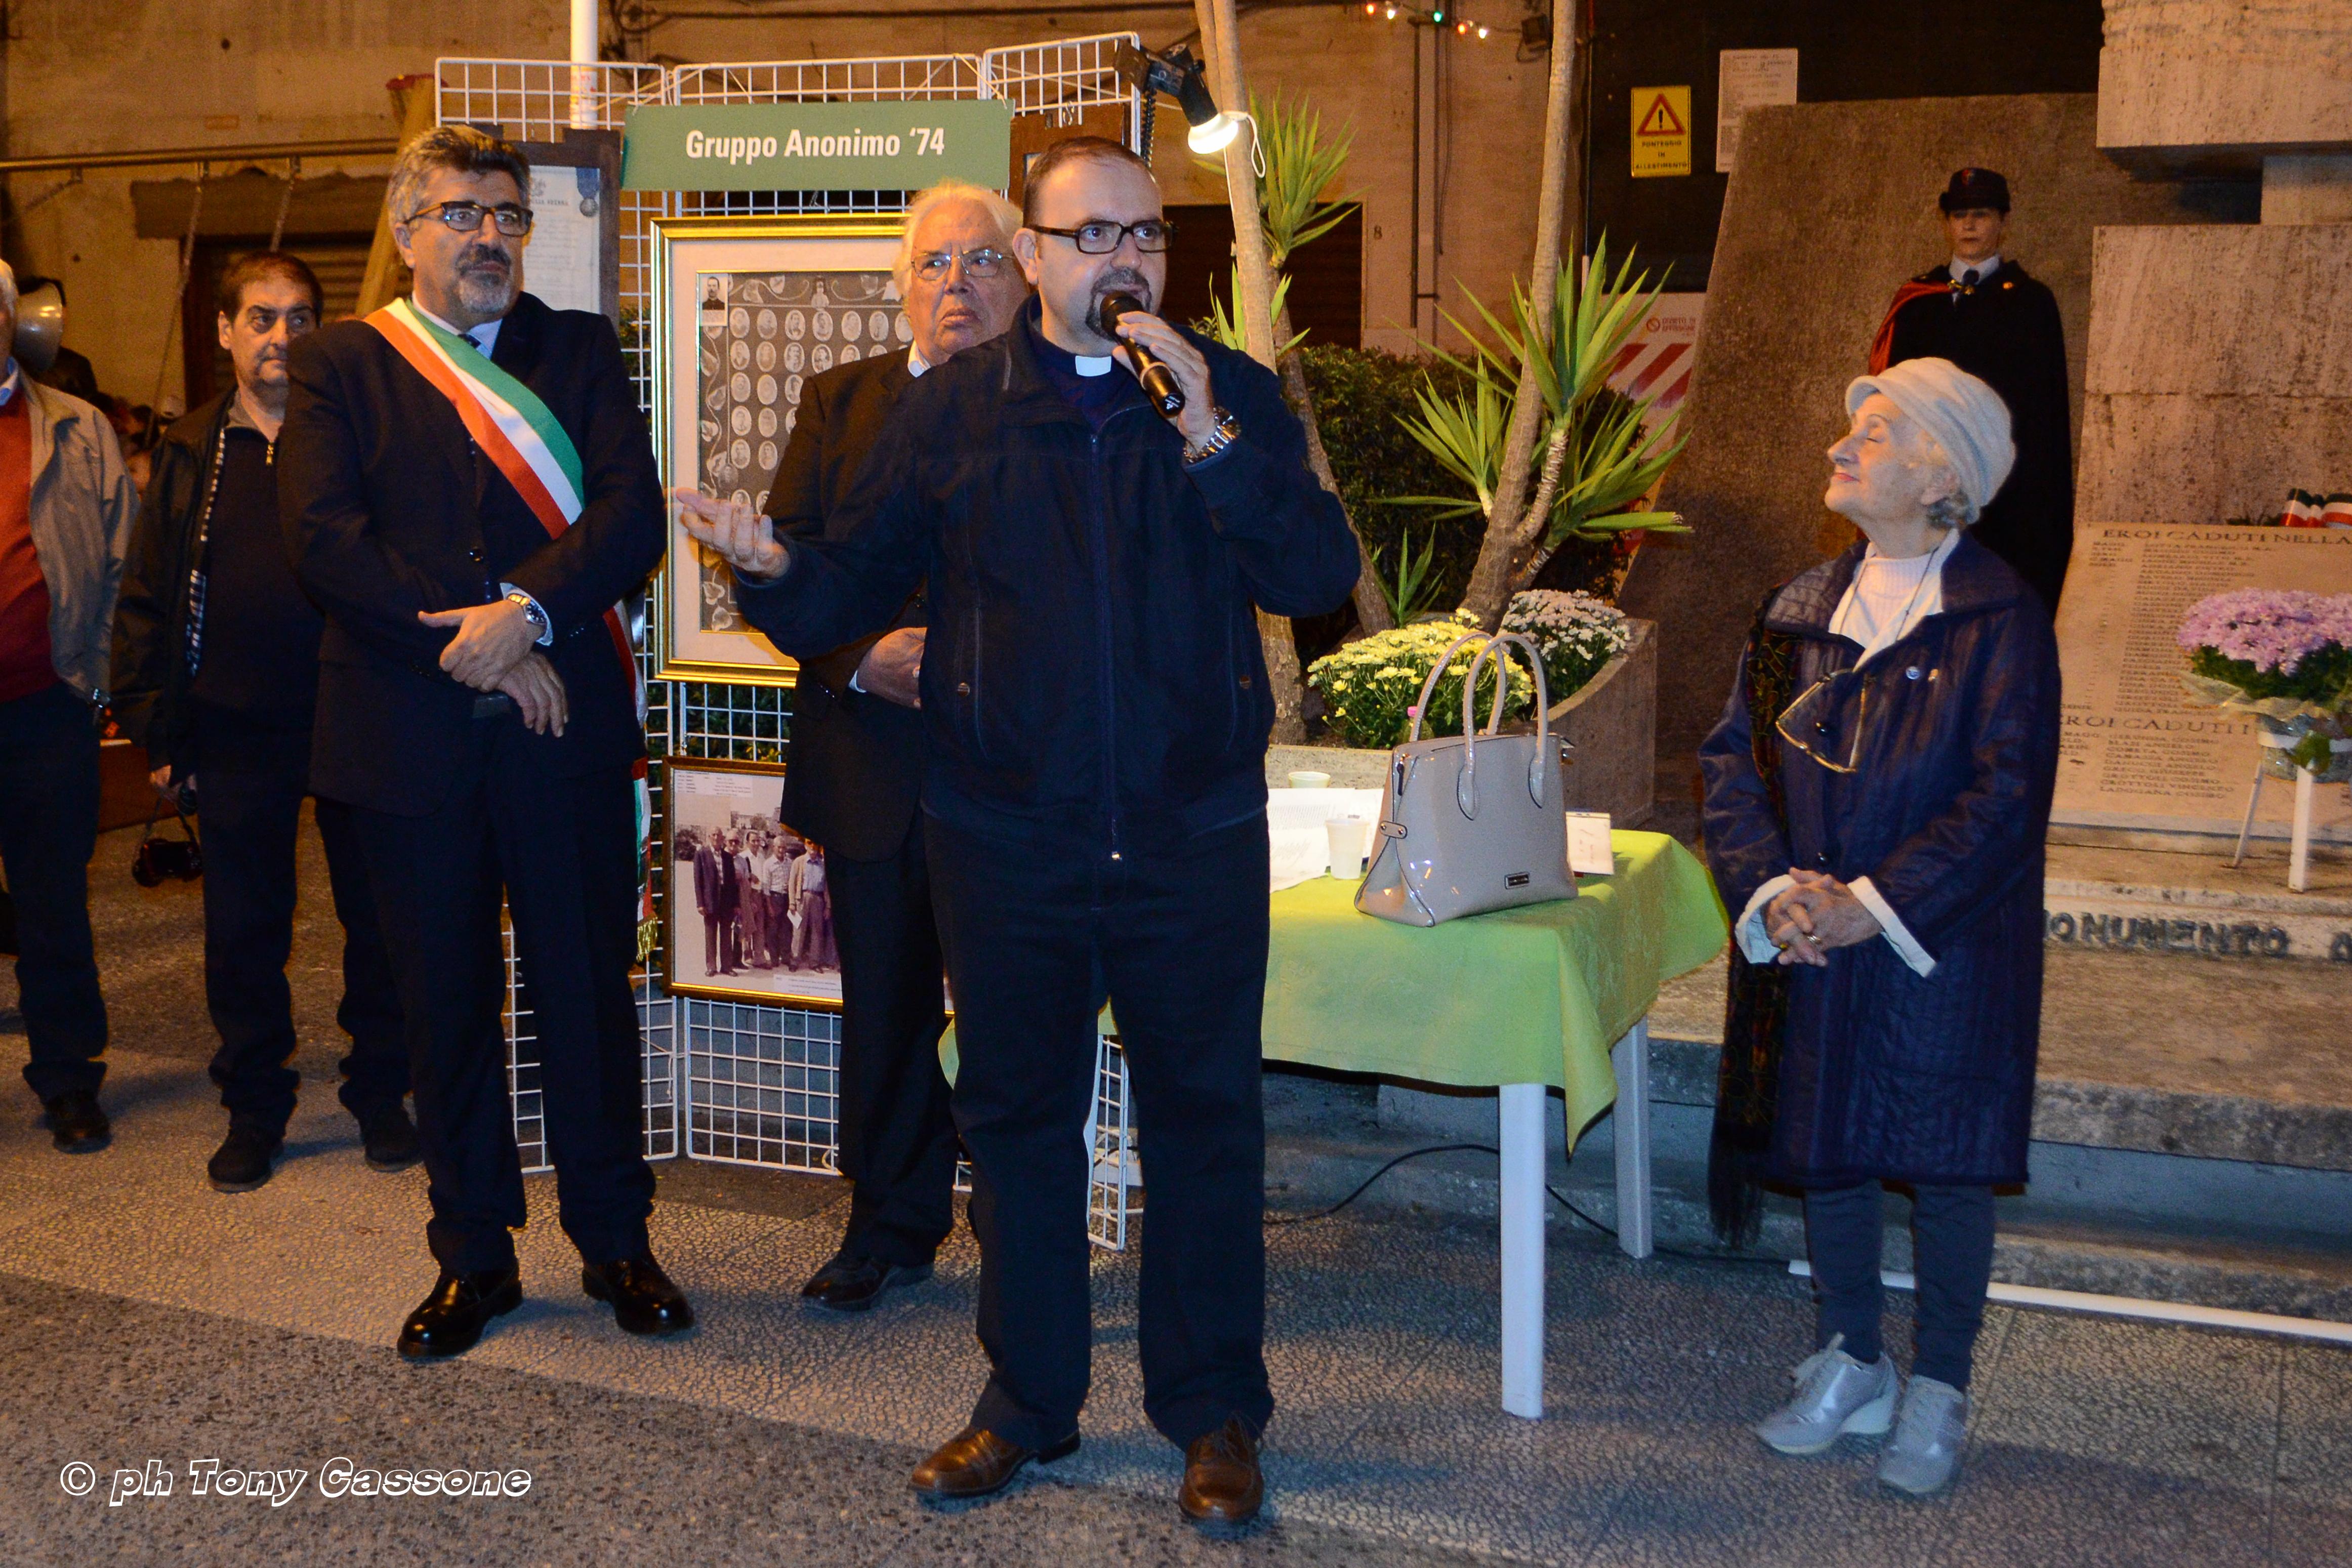 DSC_9139 IV Nov. 2016 il neo parroco Don Antonio Papagni